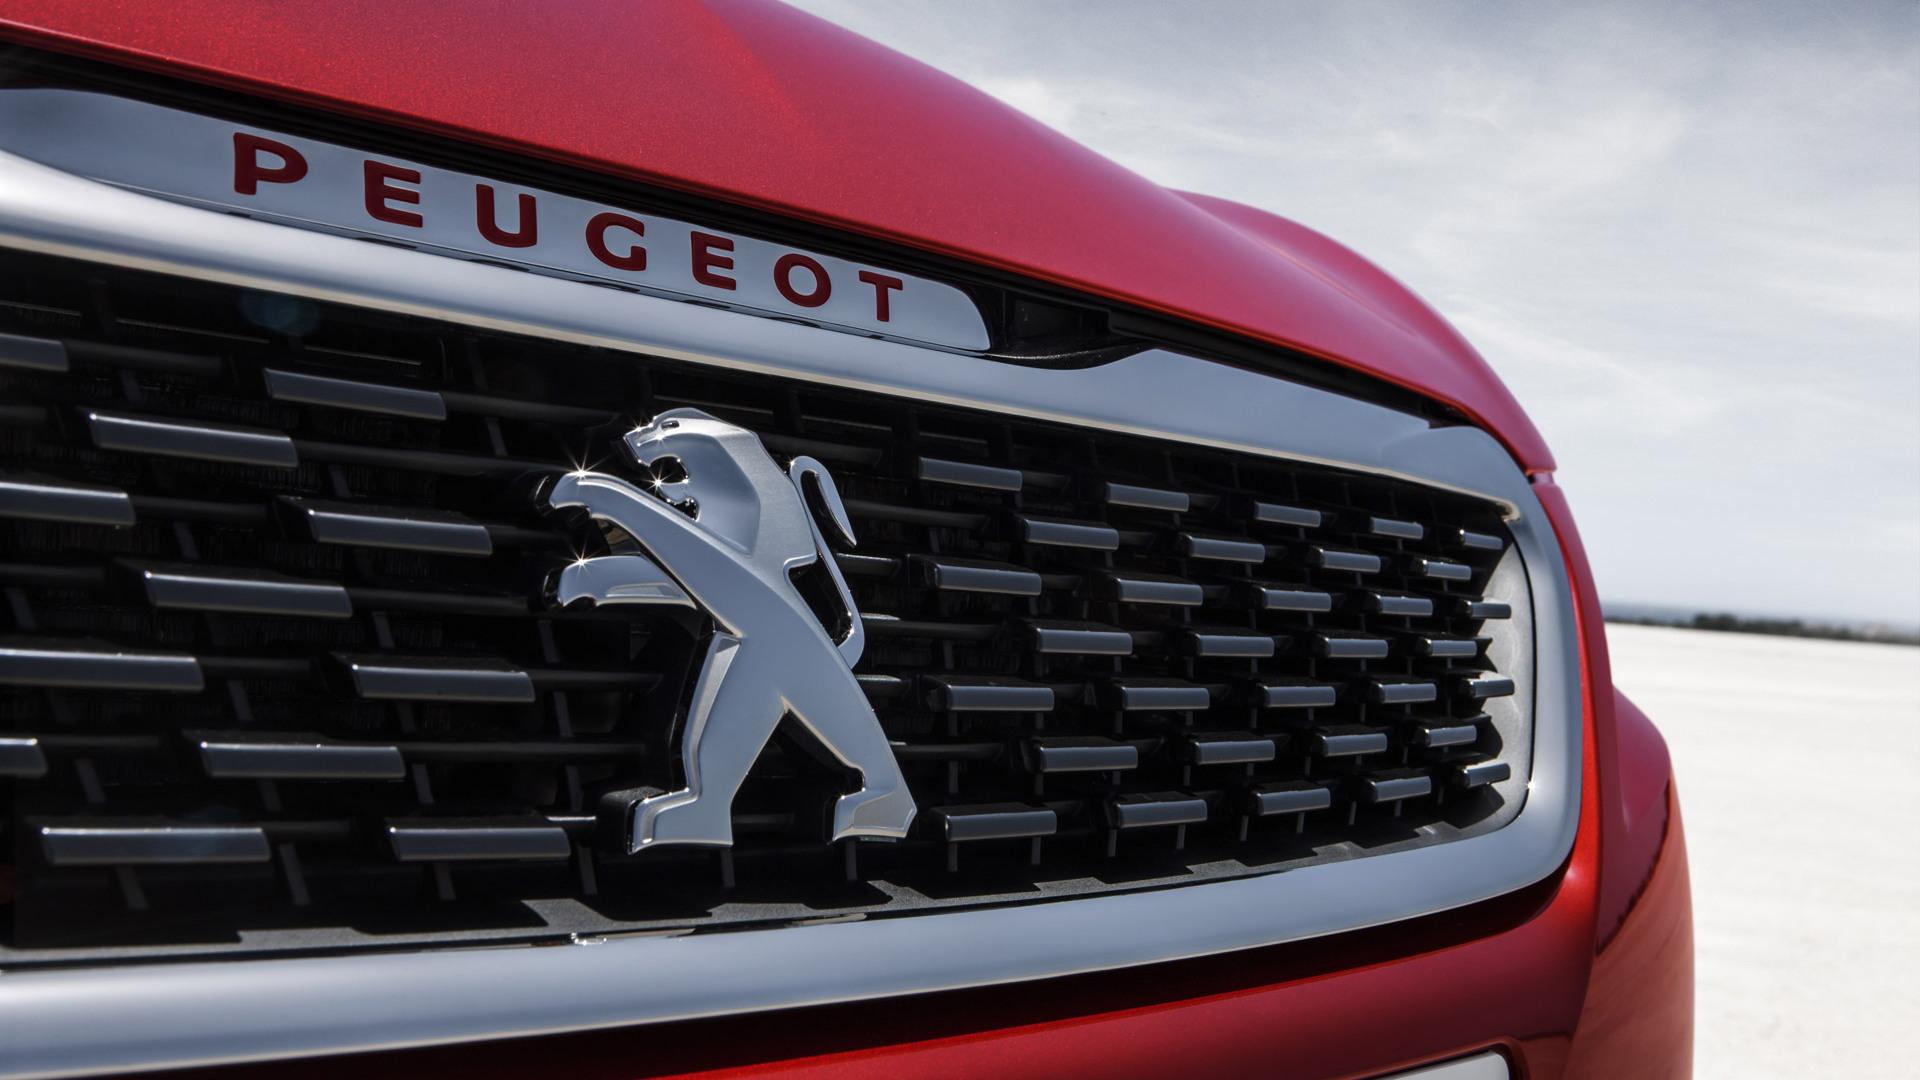 2015 Peugeot 308 GTI